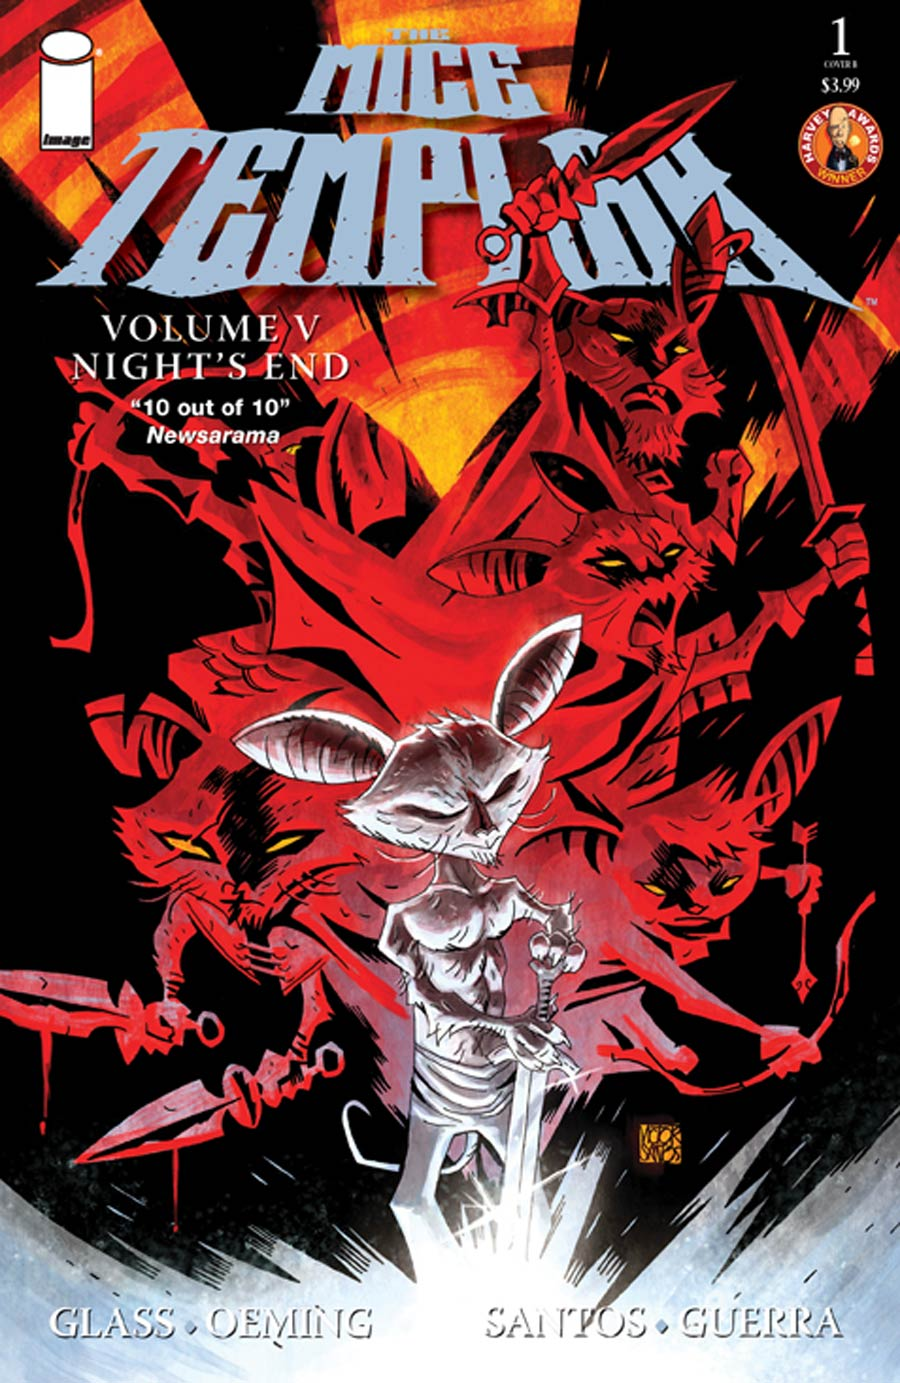 Mice Templar Vol 5 Nights End #1 Cover B Victor Santos & Chandra Free